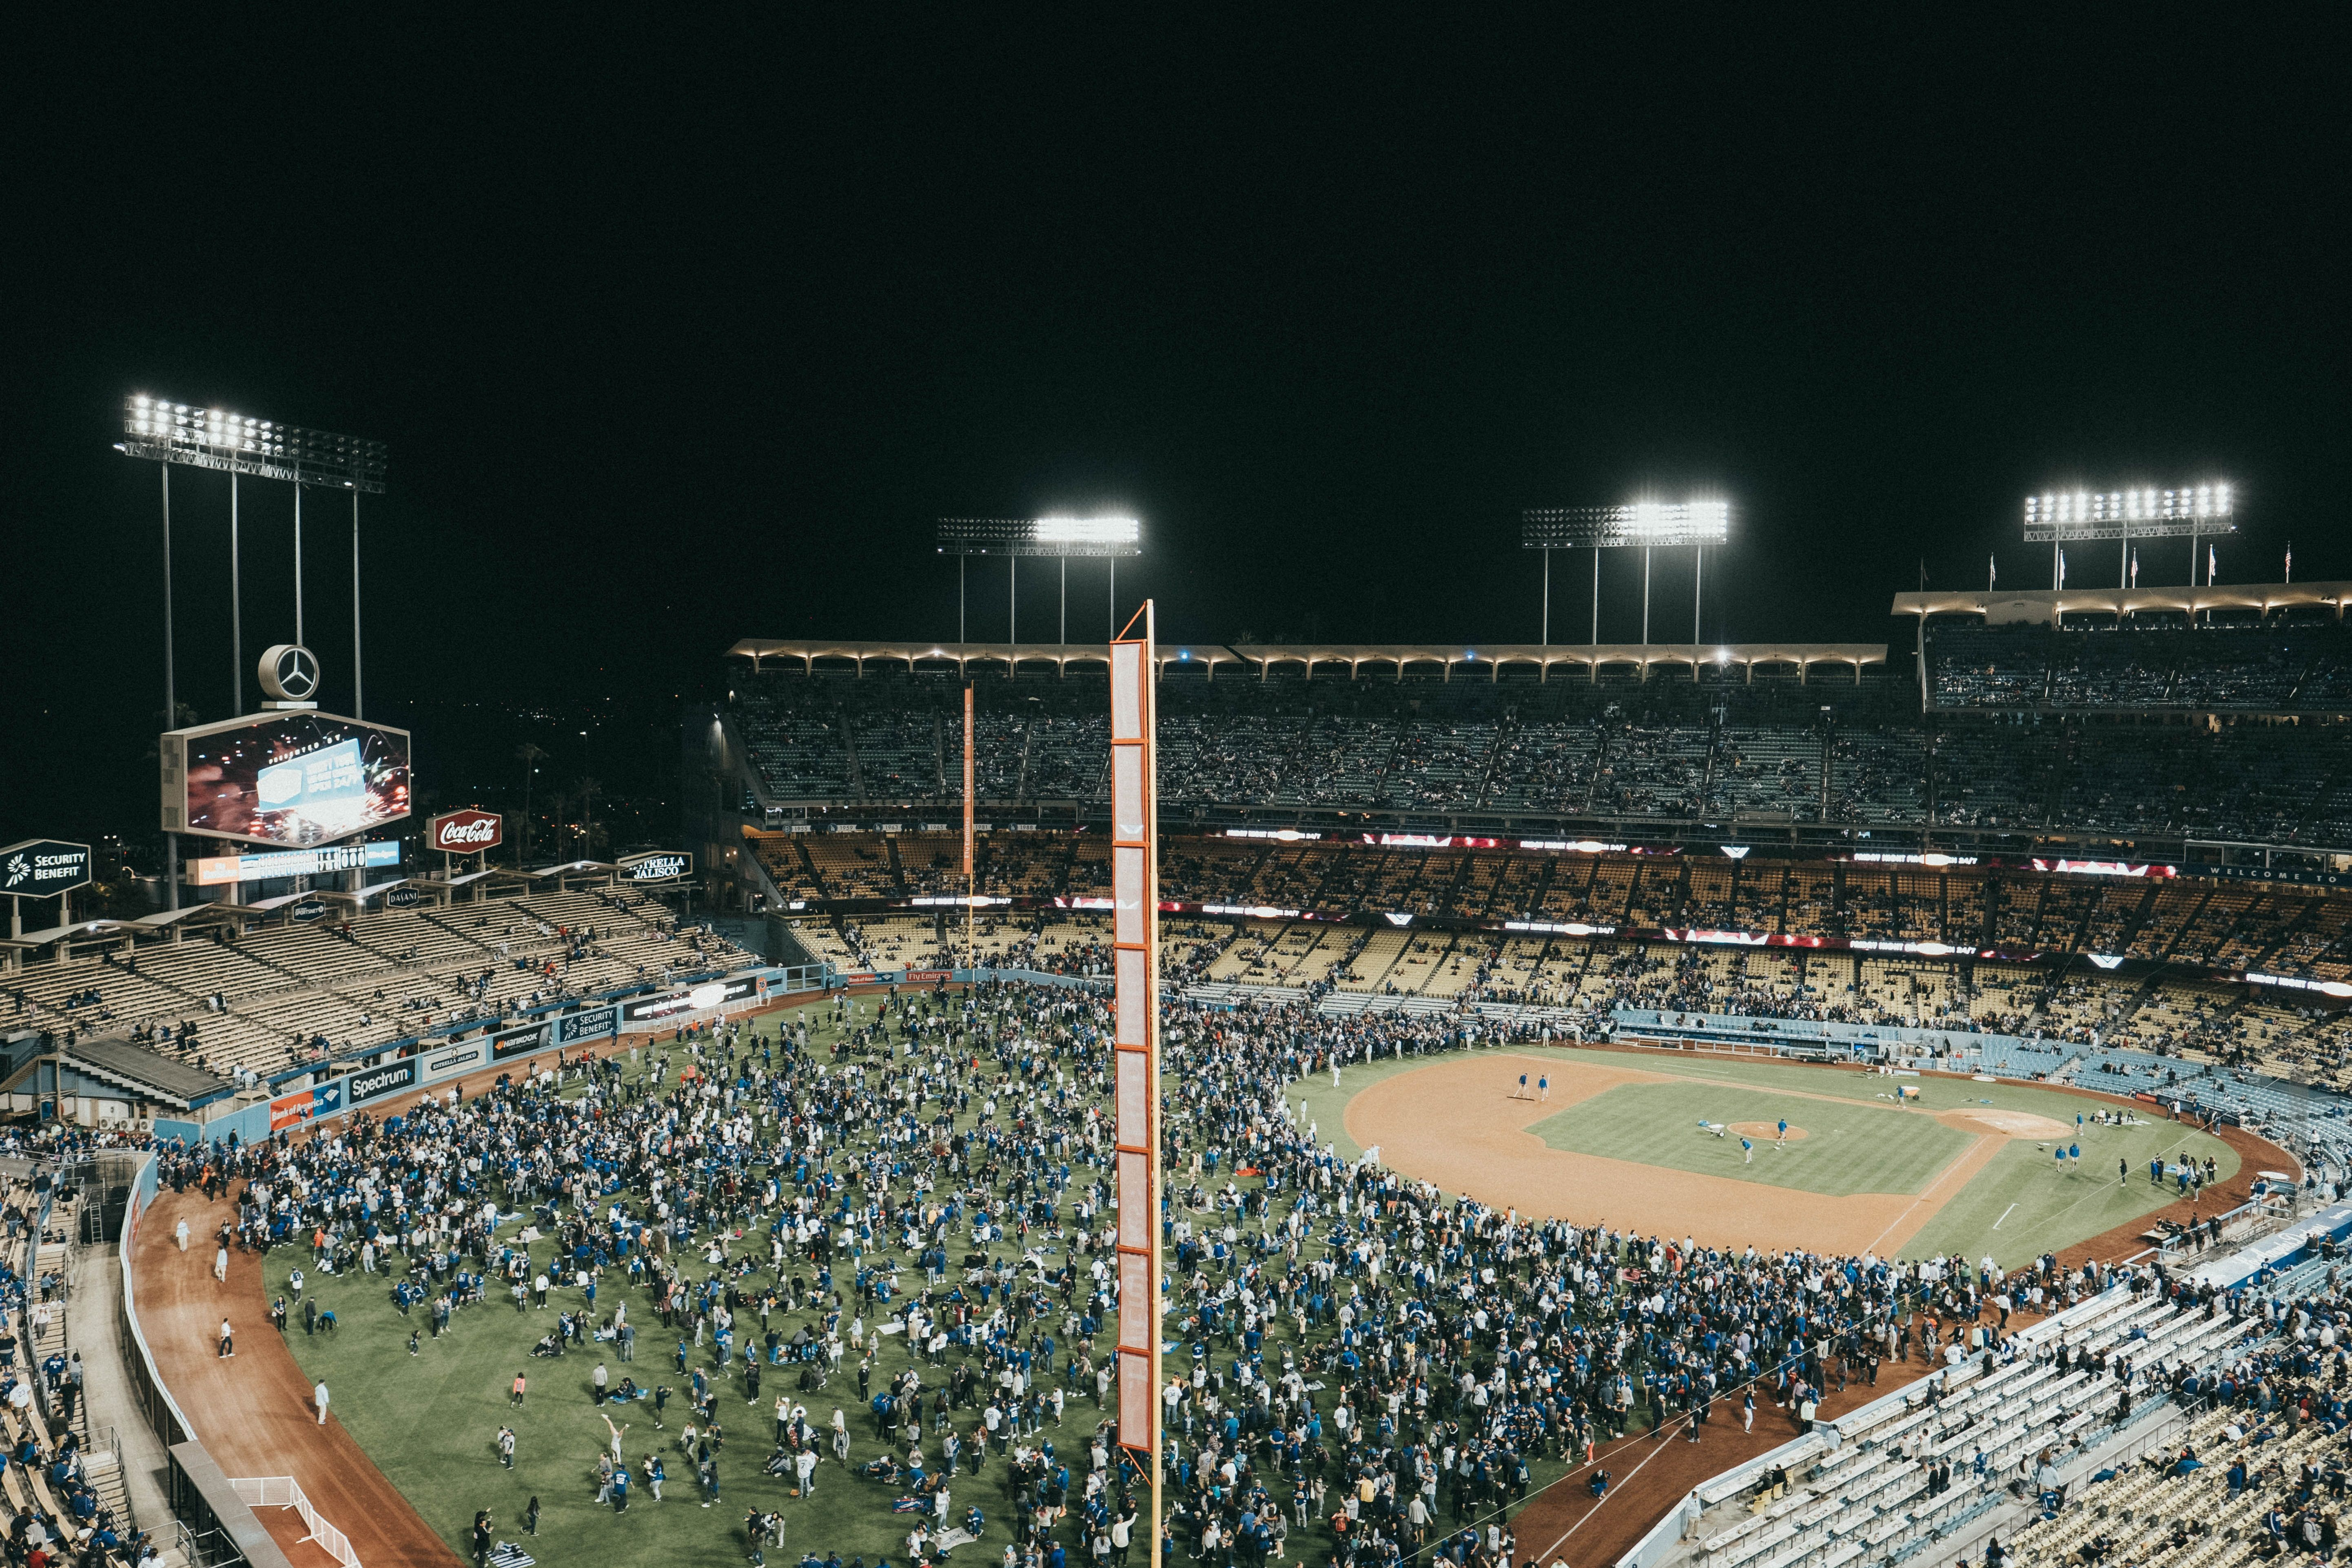 Dodger Stadium charter bus rentals